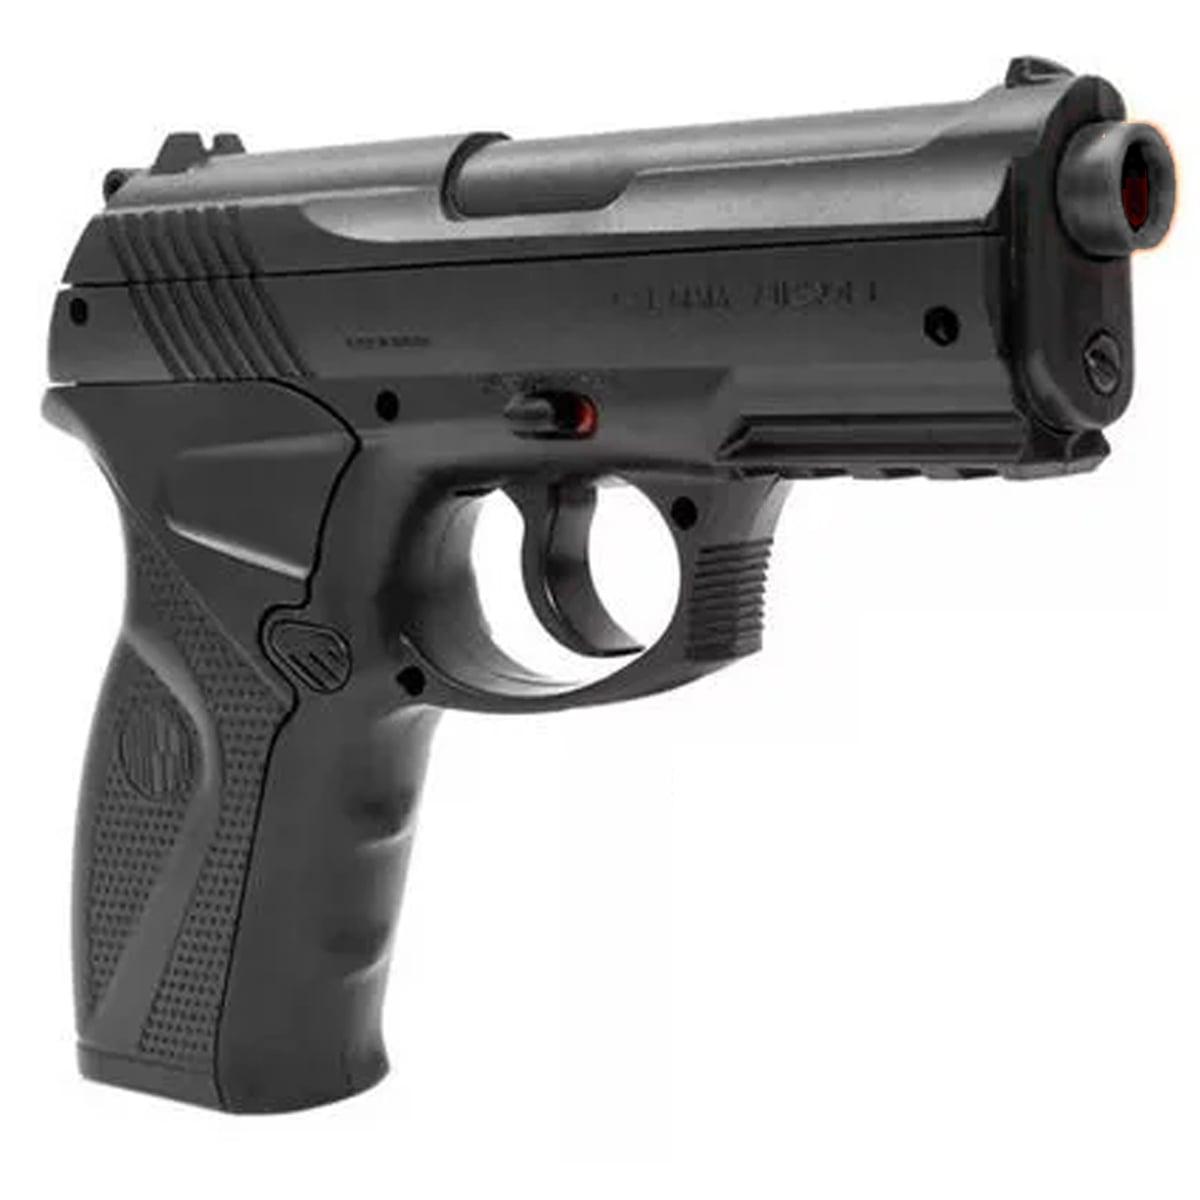 Pistola de Pressão Wingun C11 Rossi 6mm CO2 330 FPS